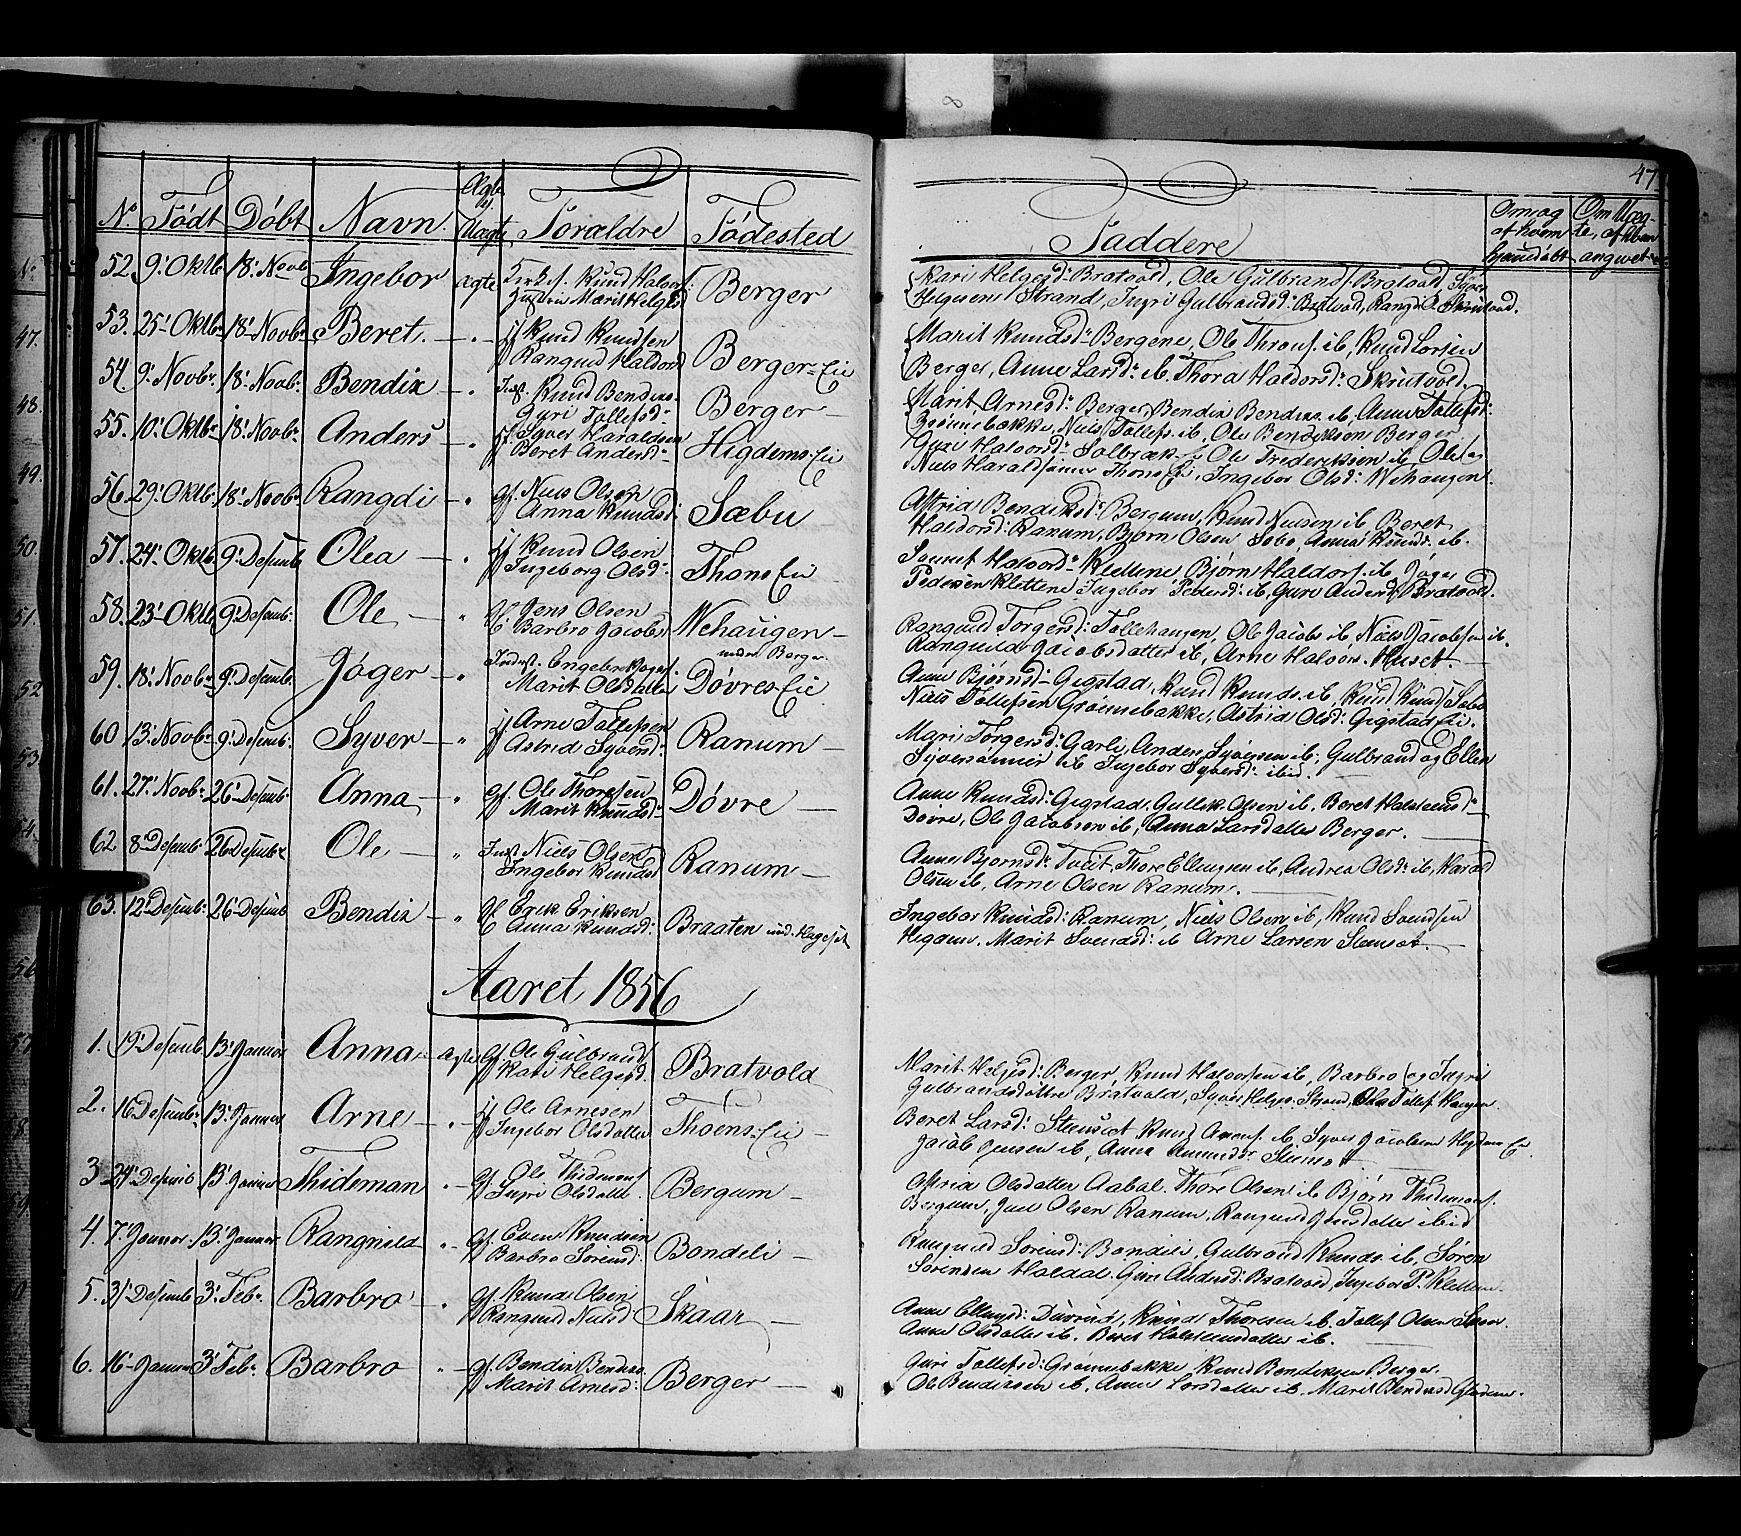 SAH, Nord-Aurdal prestekontor, Ministerialbok nr. 7, 1842-1863, s. 47